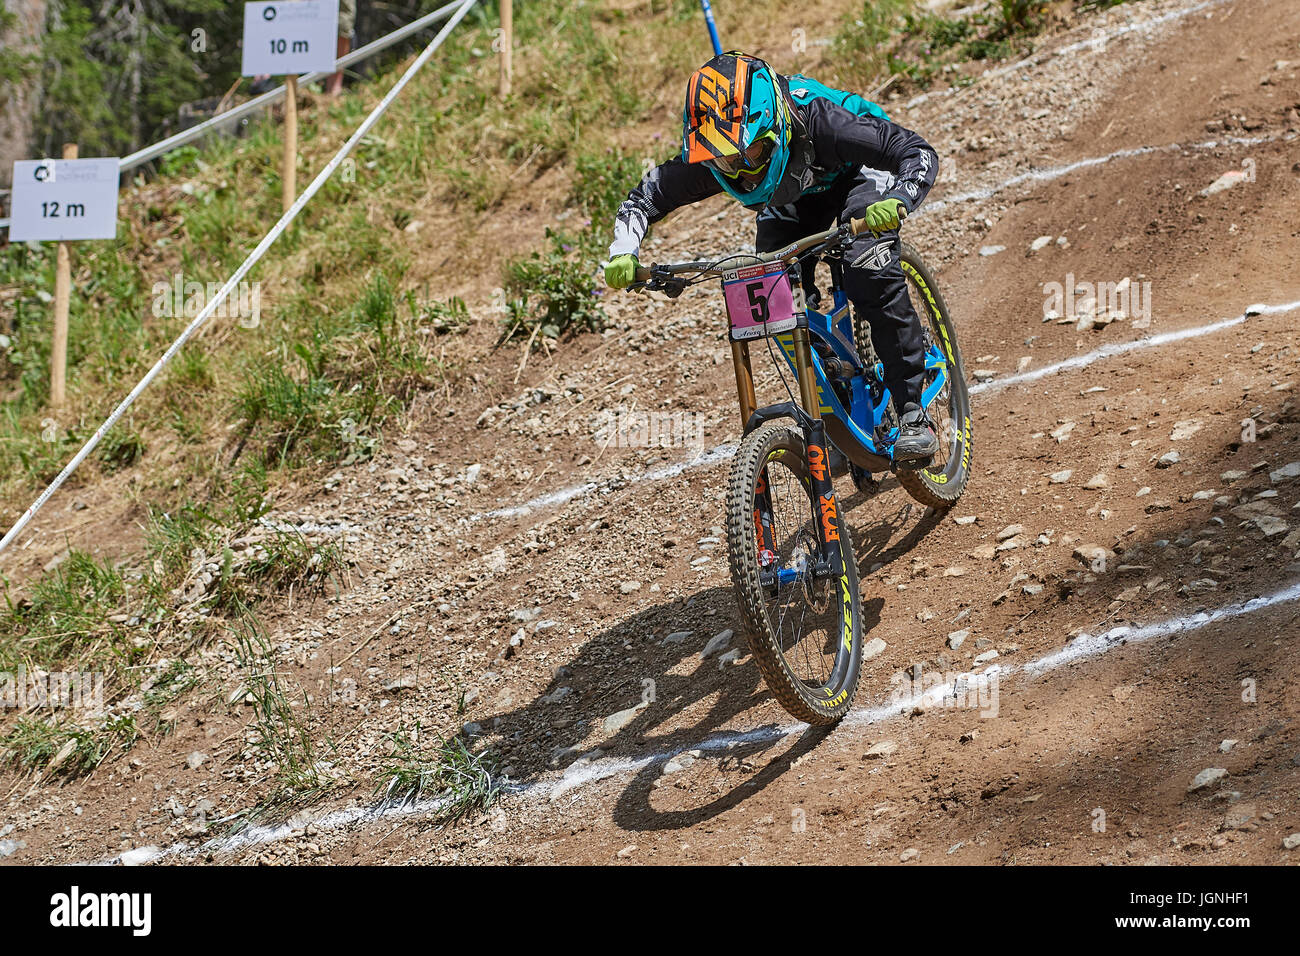 Lenzerheide, Switzerland. 8 July 2017. Emilie Siegenthaler from PIVOT FACTORY RACING during the UCI Mountain Bike - Stock Image